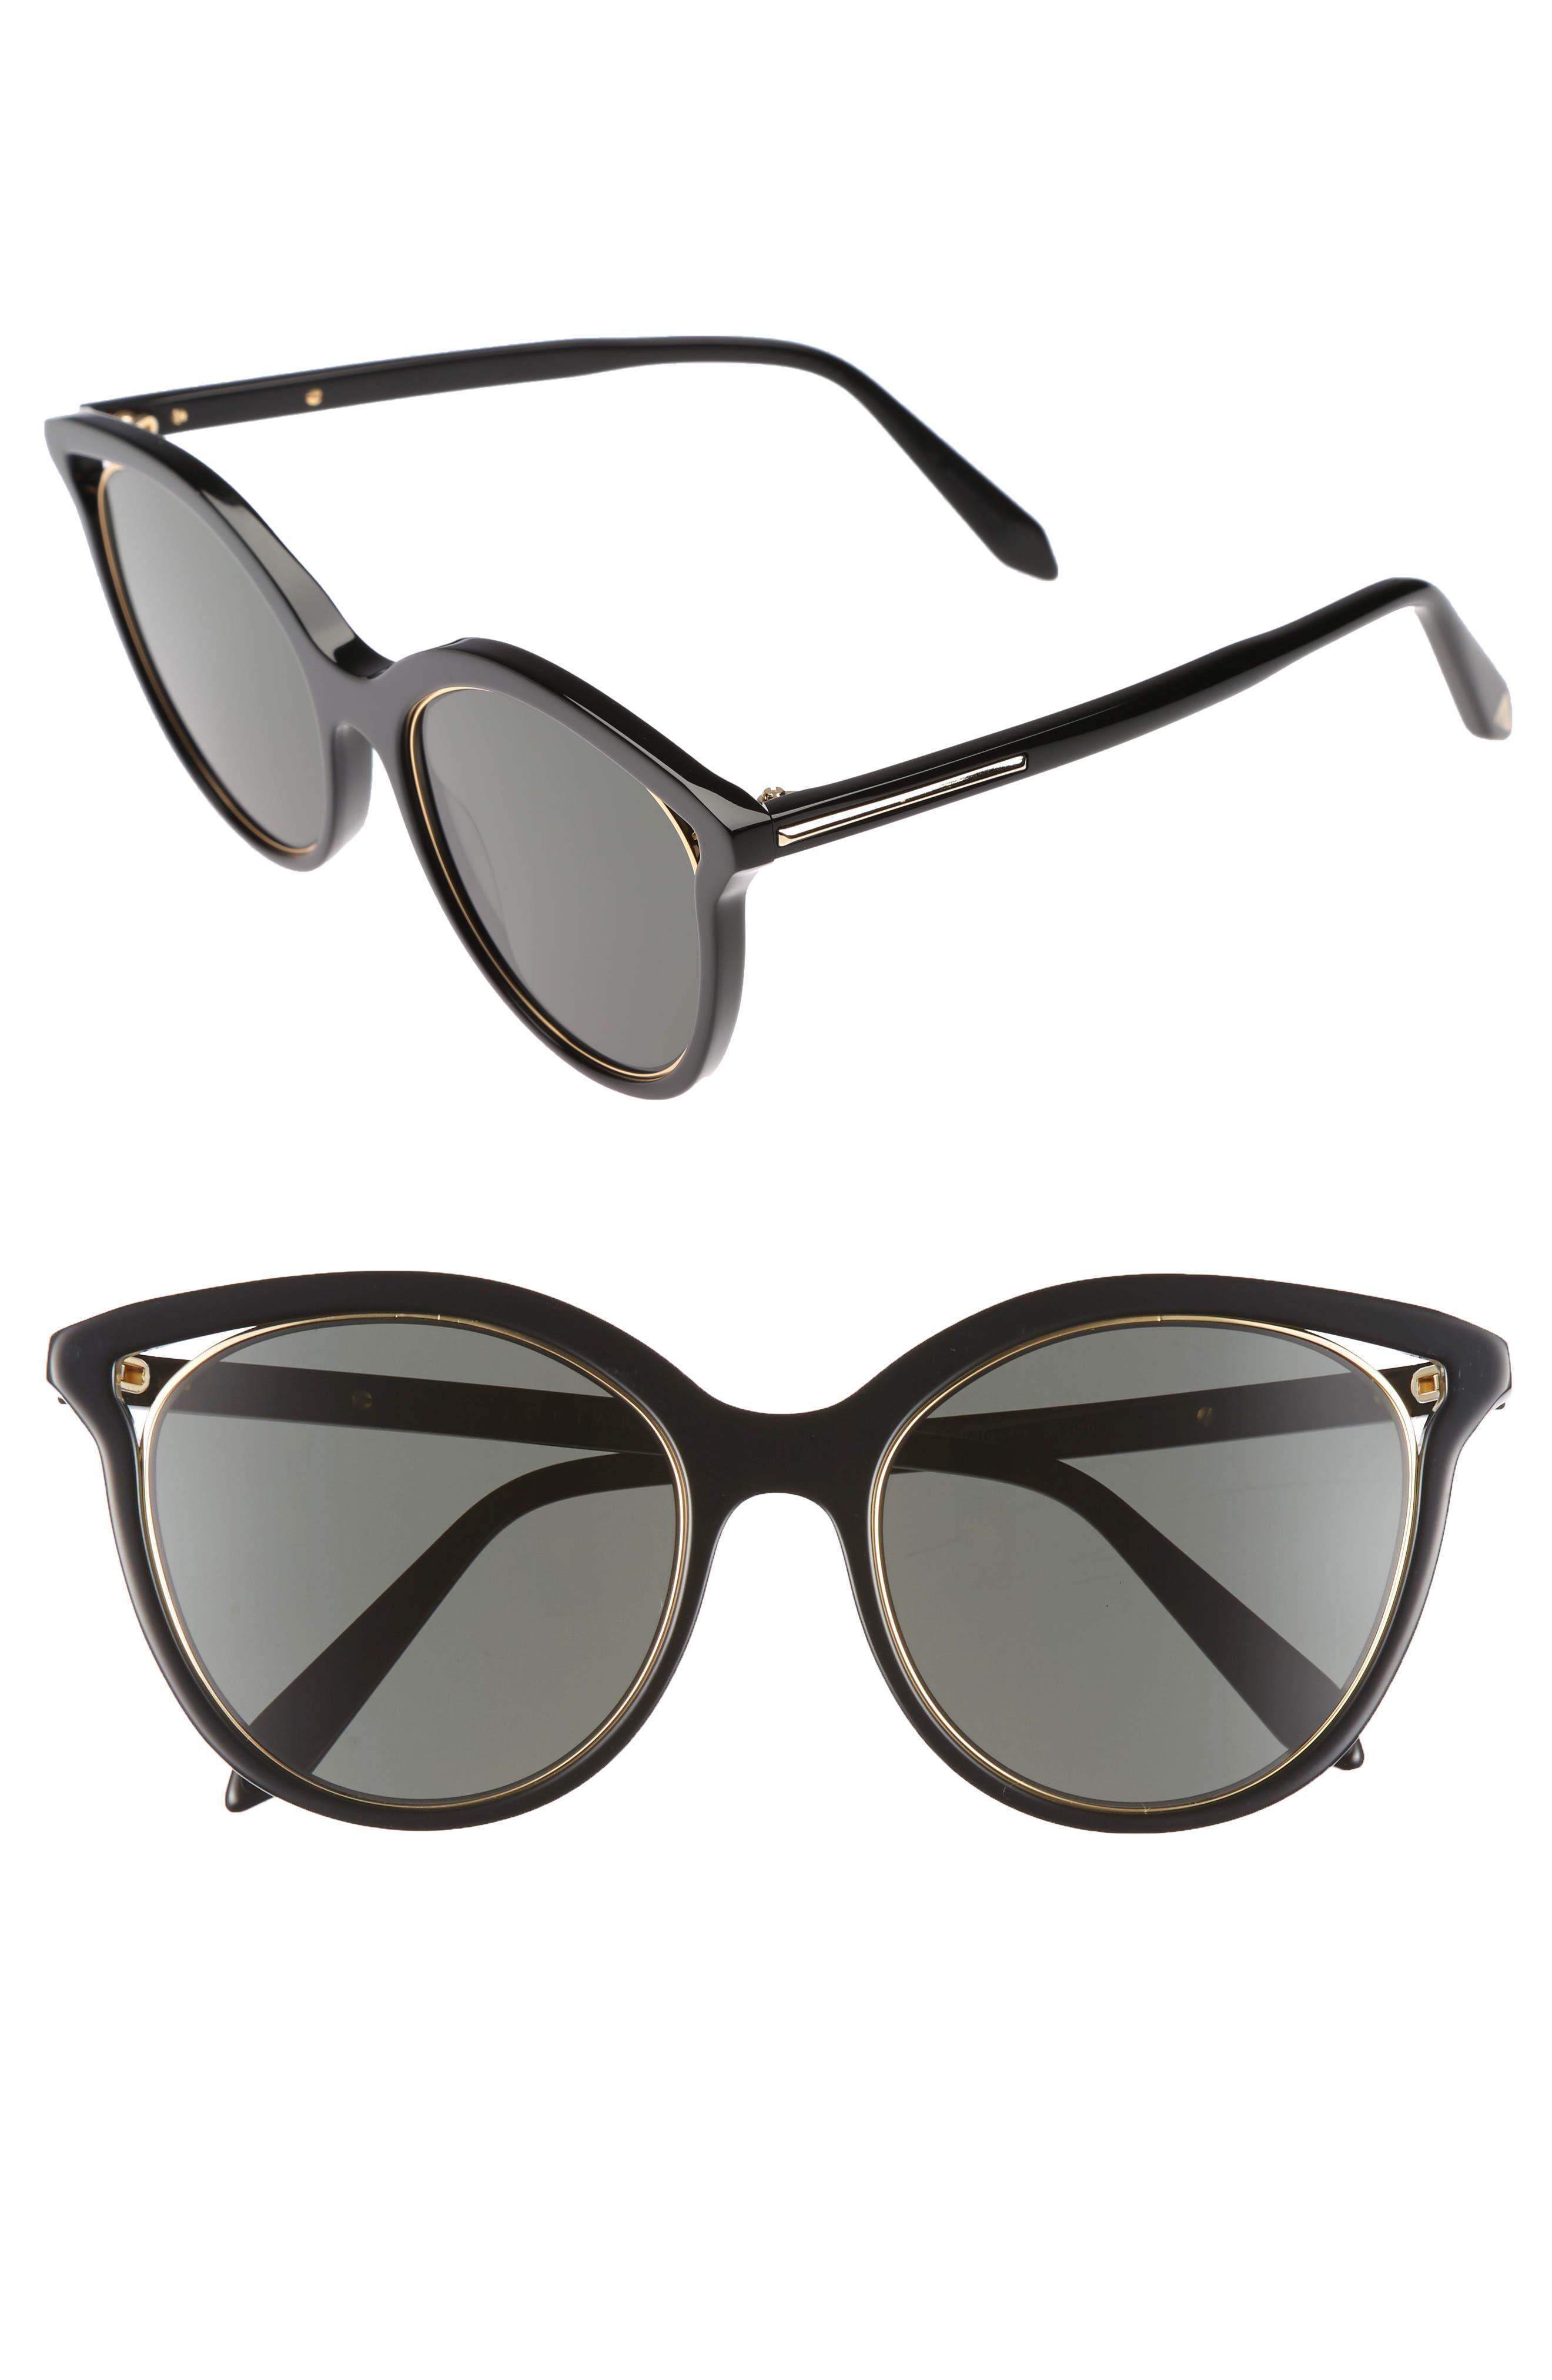 VICTORIA BECKHAM Cutaway Kitten 54mm Cat Eye Sunglasses, Main, color, BLACK/ GOLD